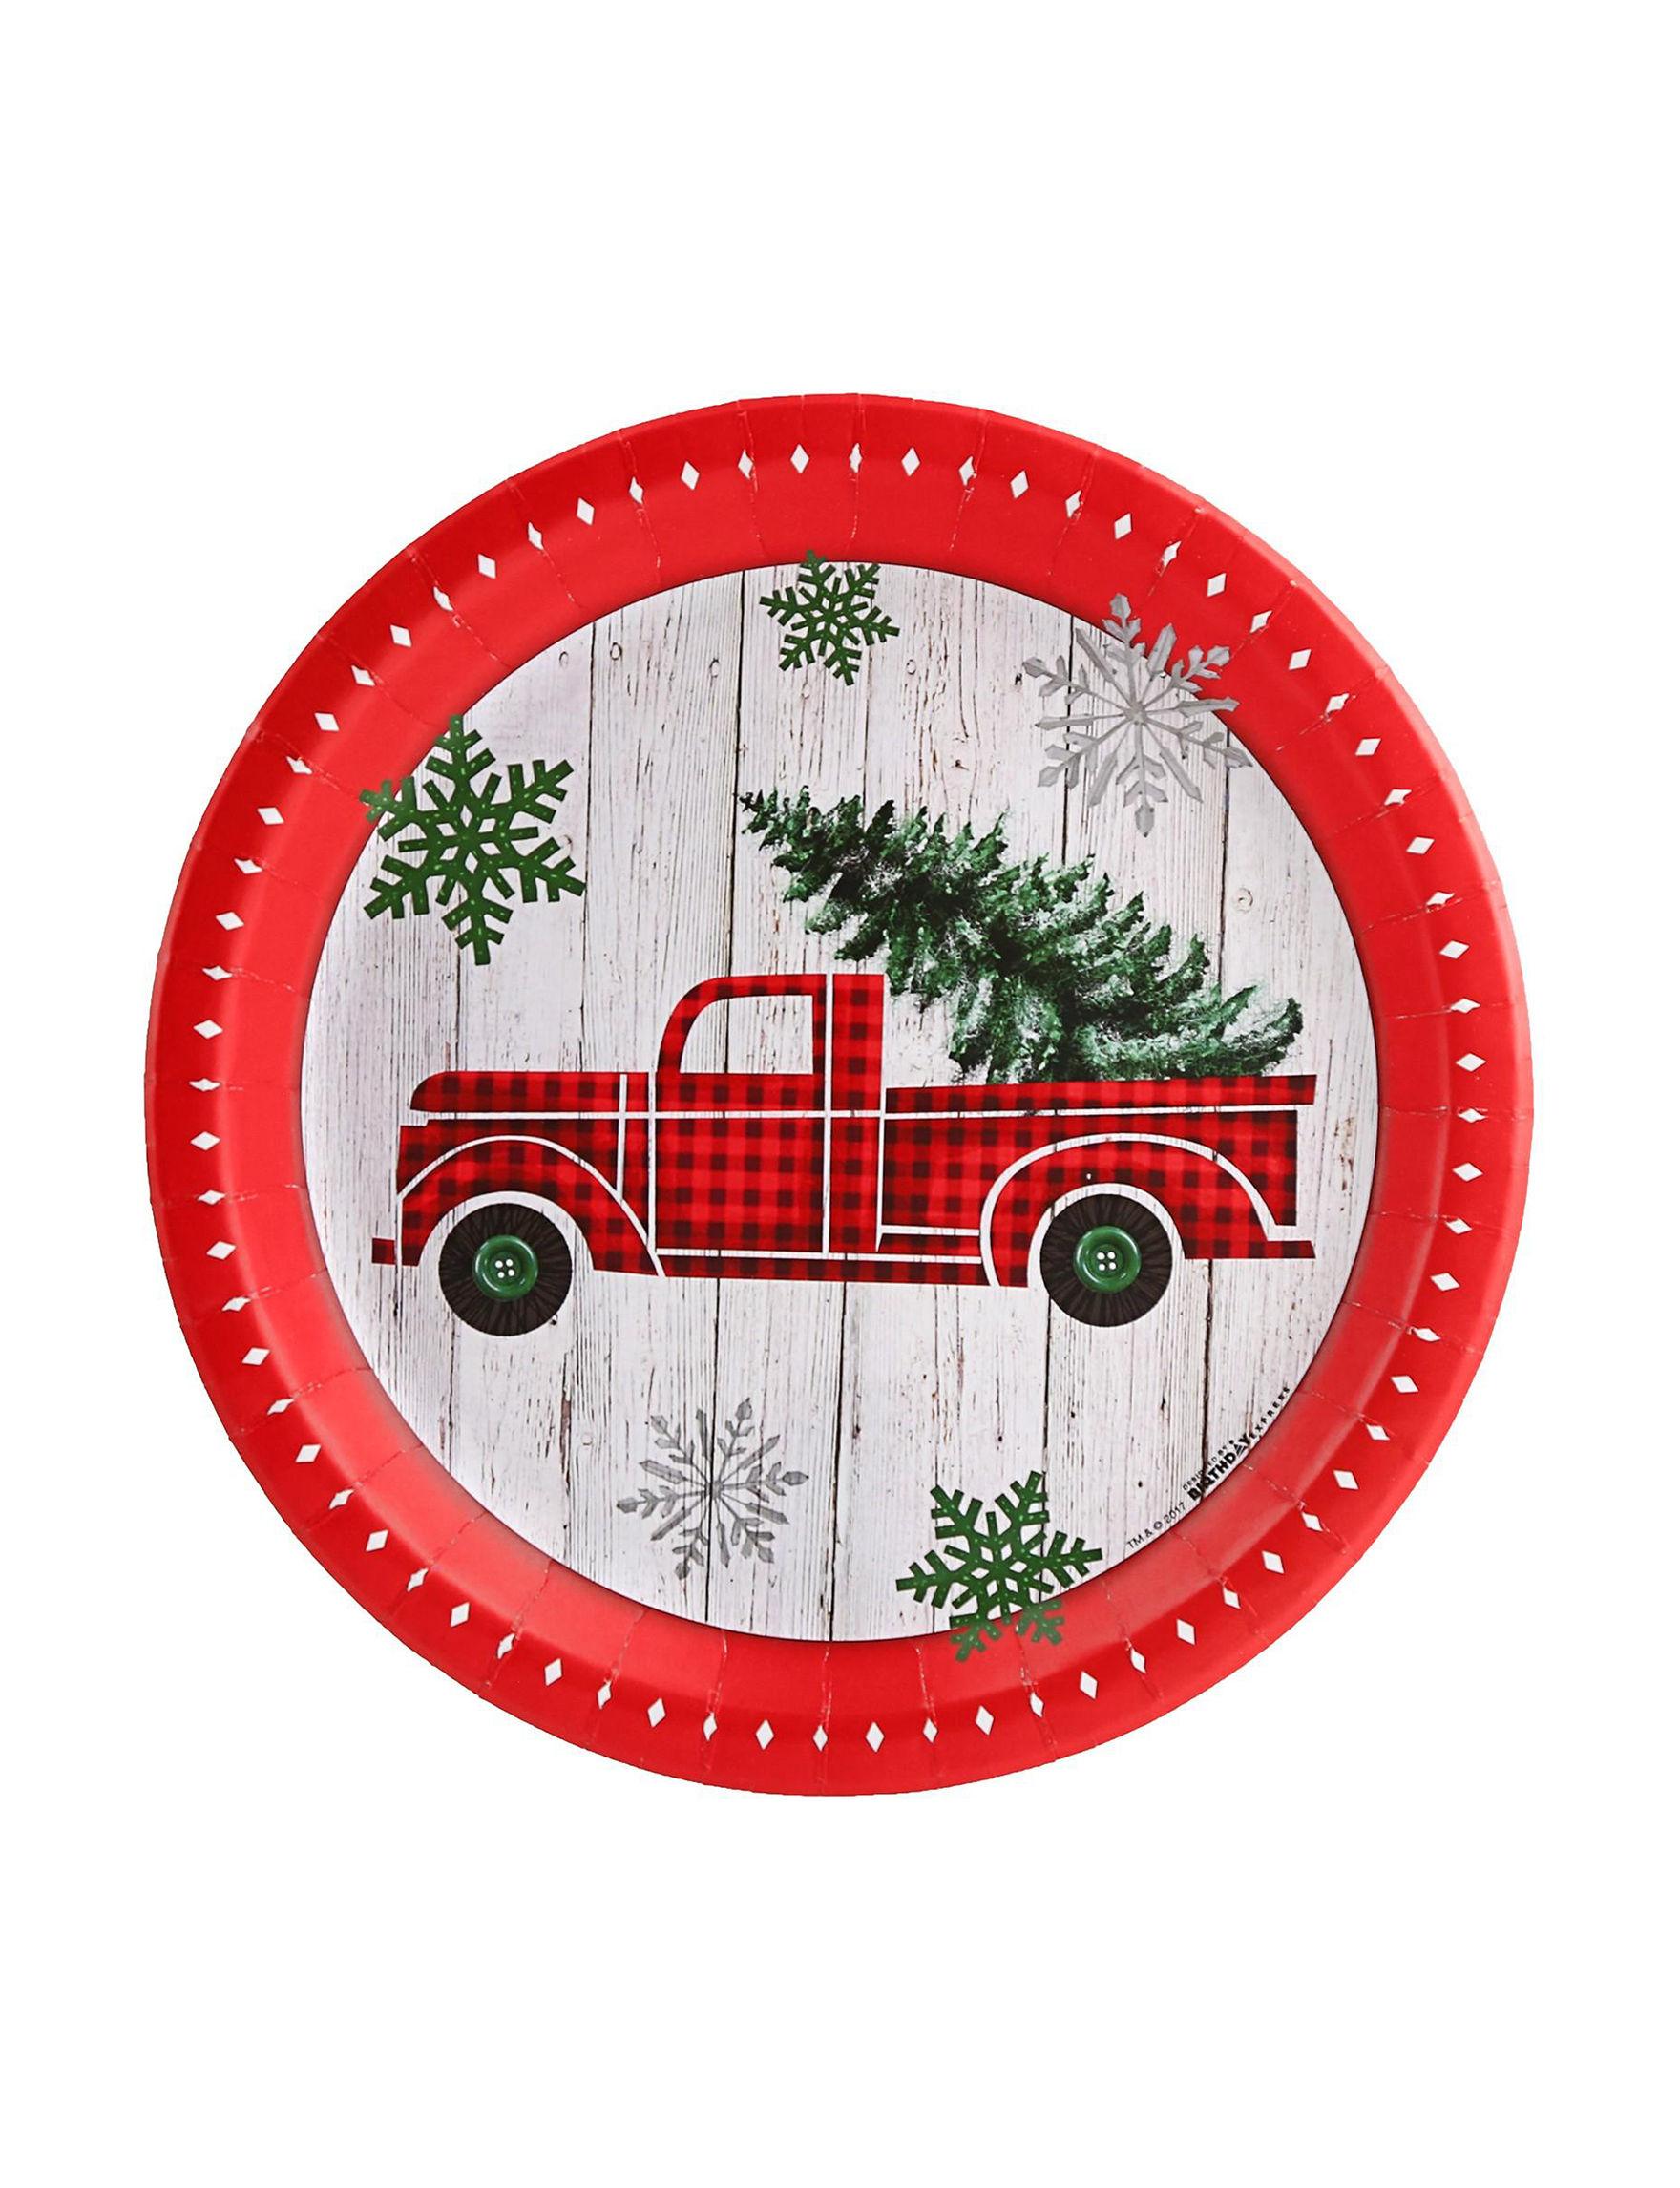 BuySeasons Red Multi Decorative Objects Holiday Dining & Entertaining Holiday Decor Serveware